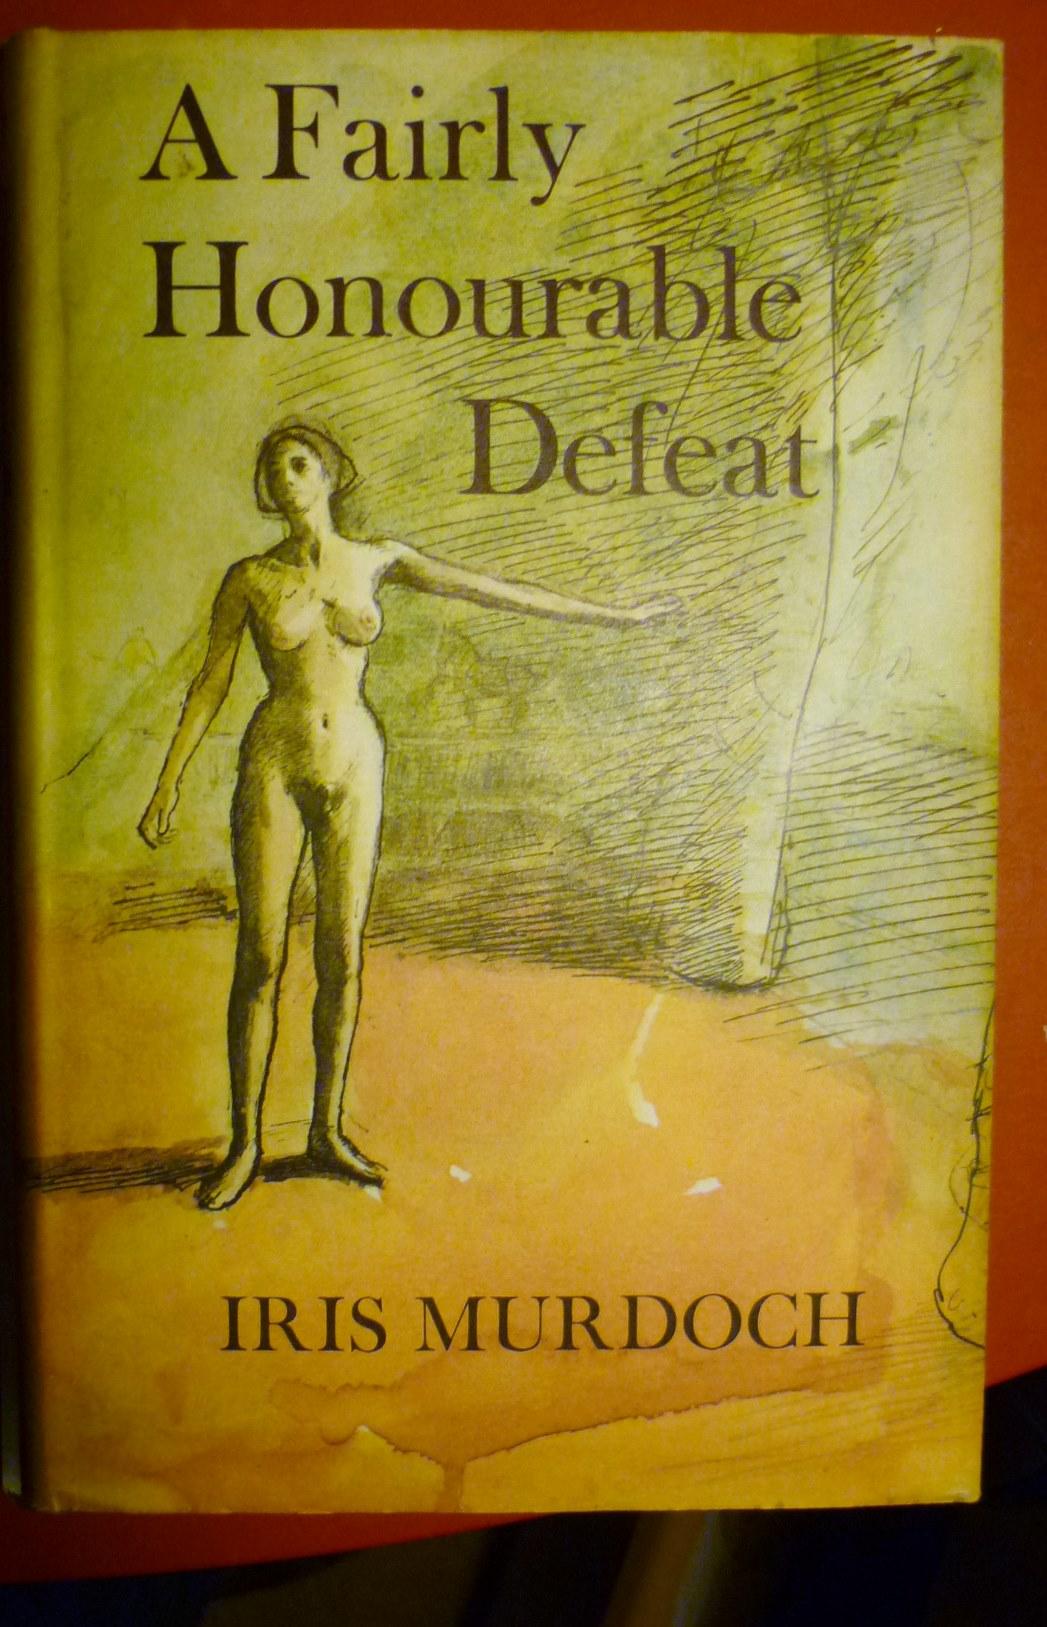 Iris Murdoch:  A Fairly Honourable Defeat